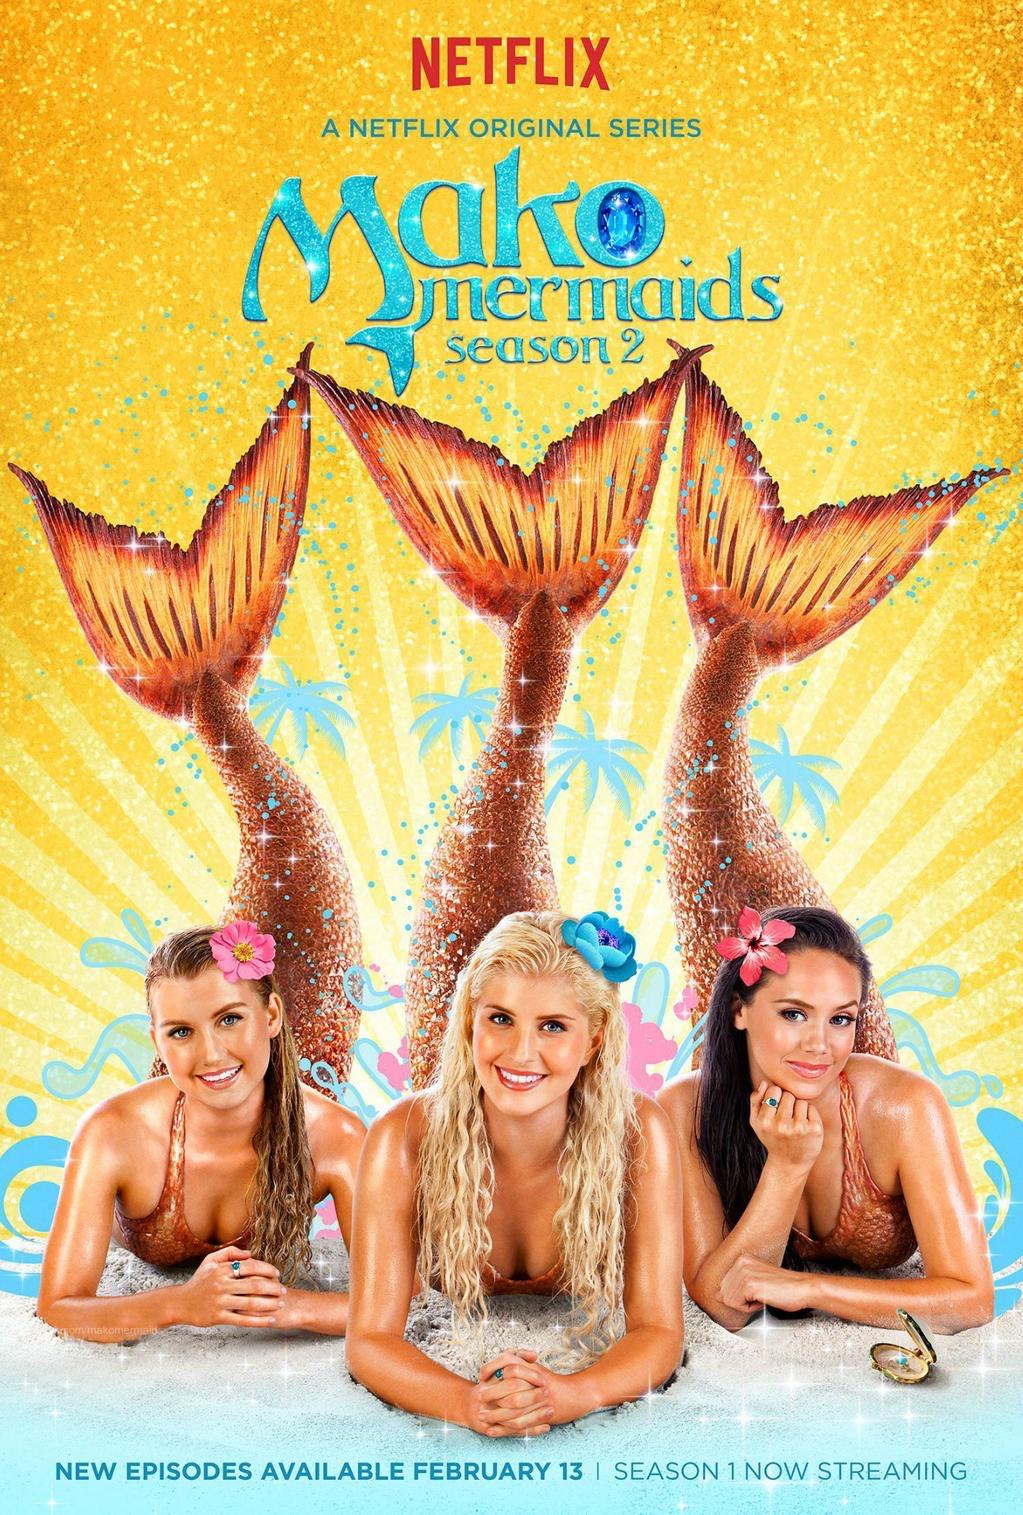 Mako Mermaids S2 poster by Yugi Dan Yami on DeviantArt